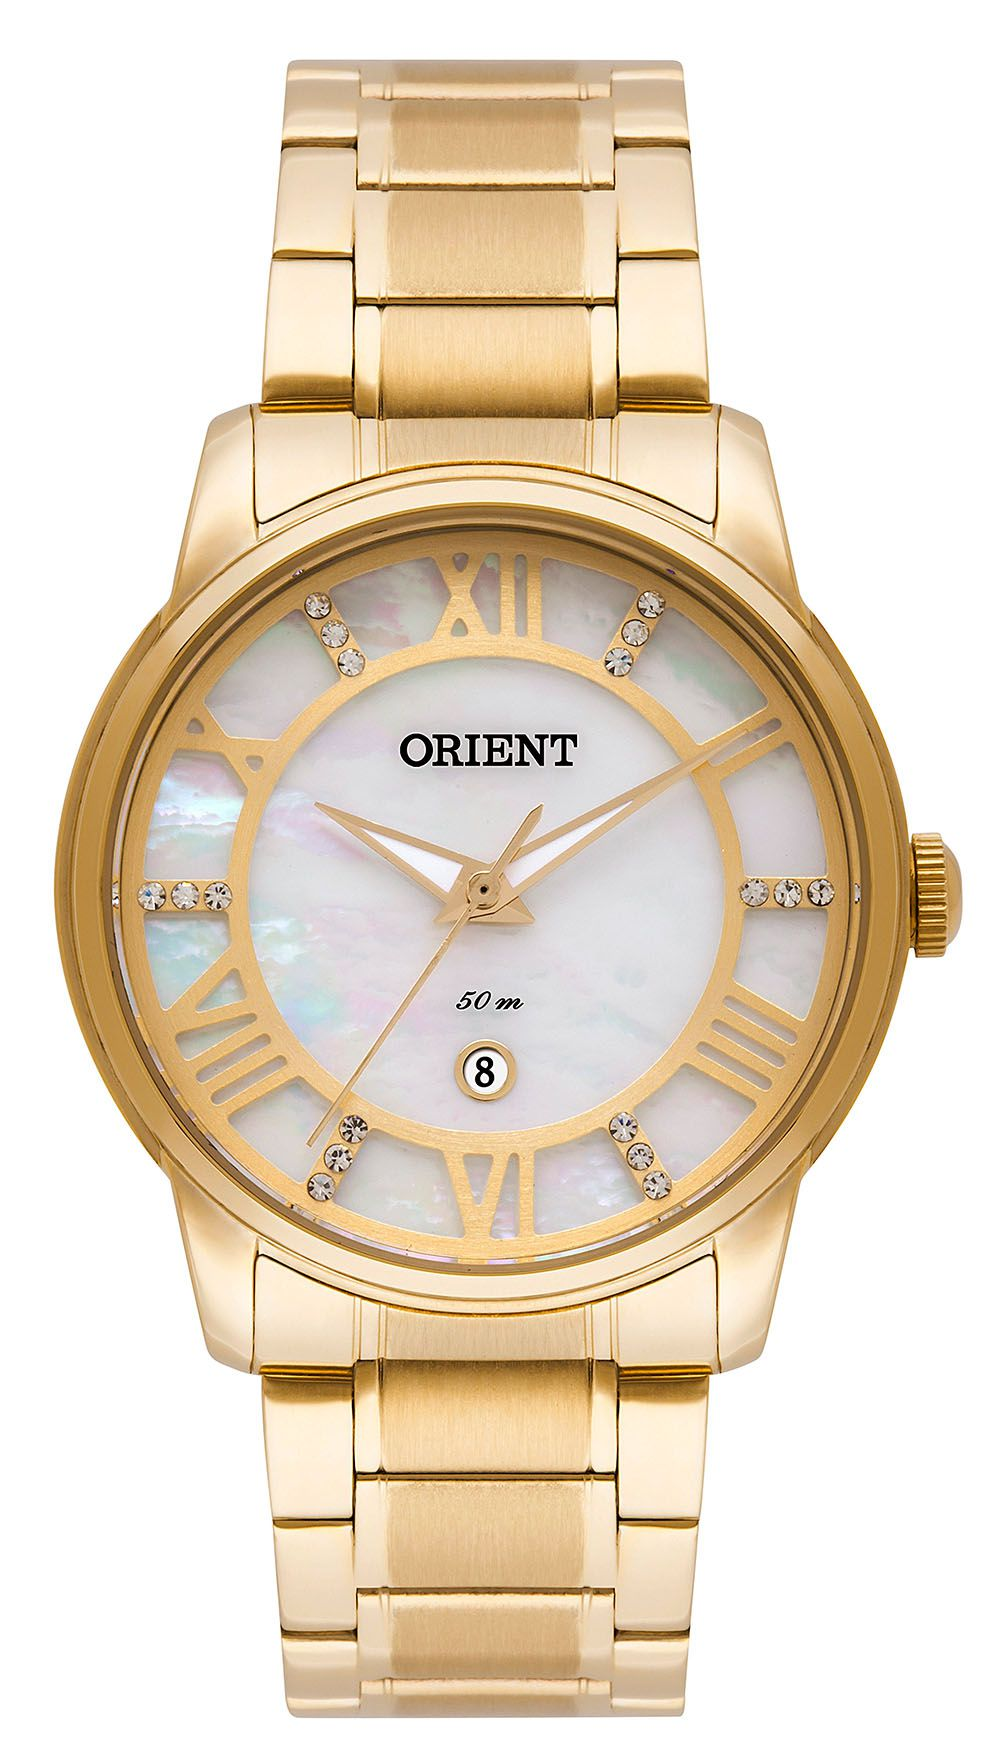 Relógio Feminino Casual Dourado FGSS1148-B3KX Orient